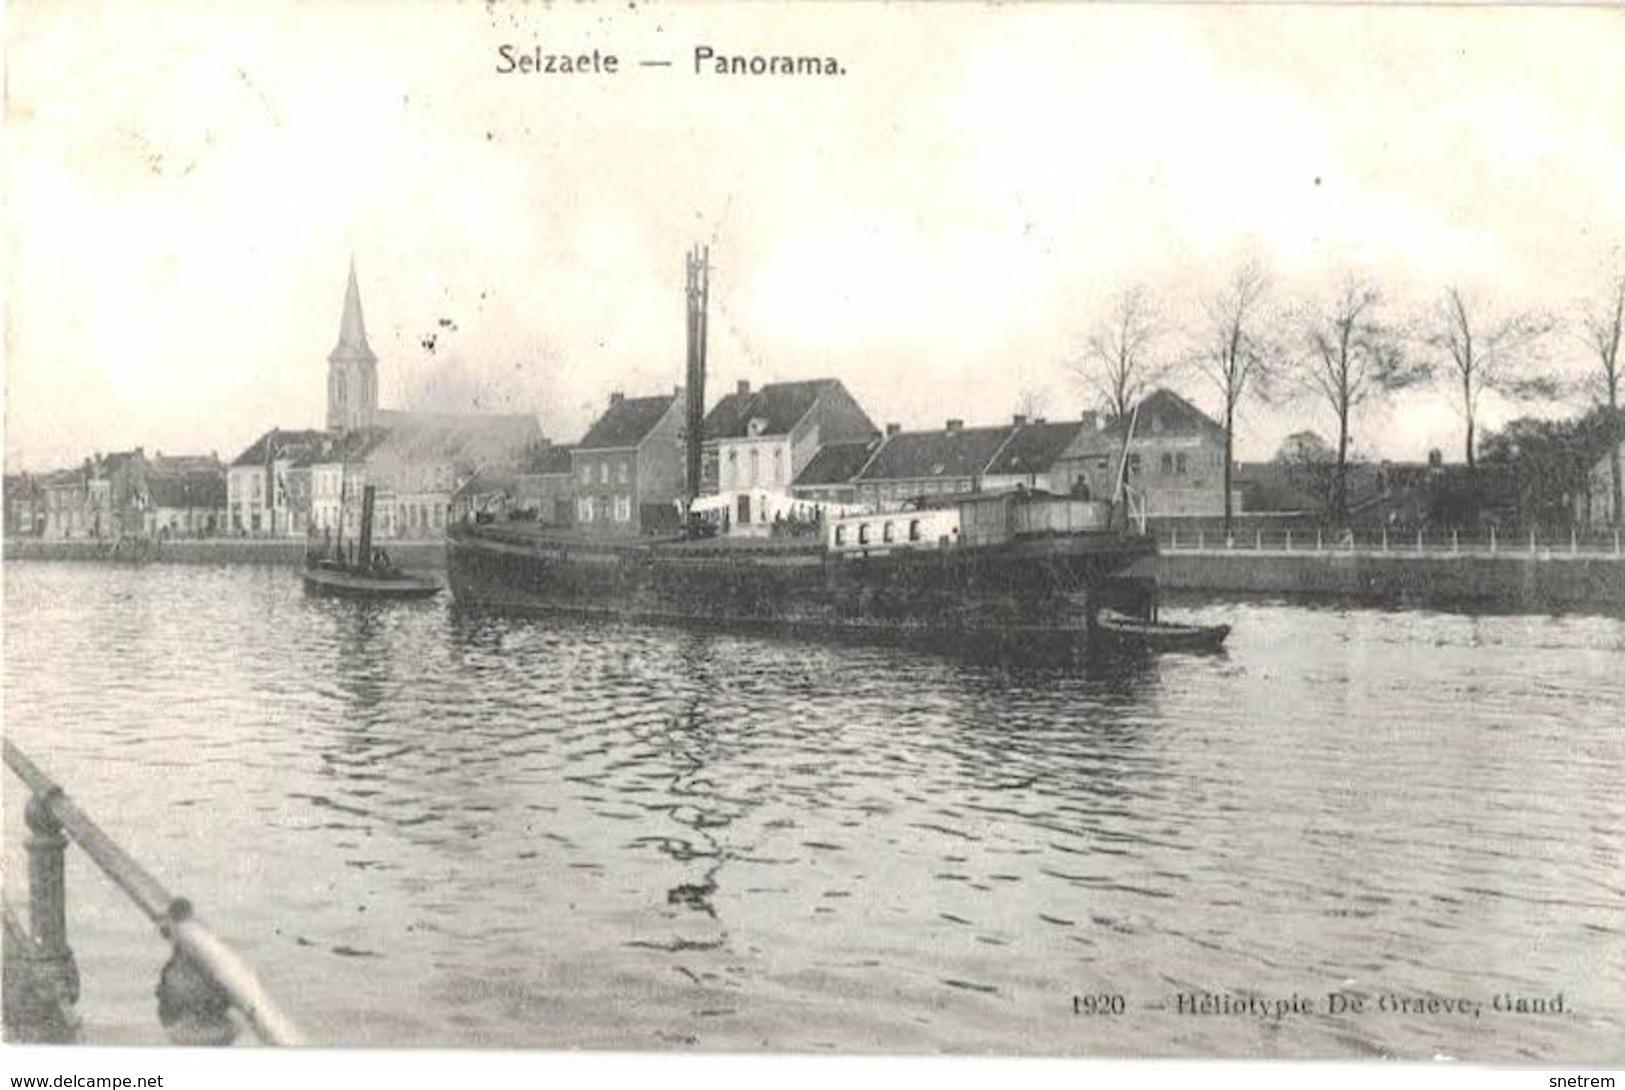 Belgie - Belgique - Selzaete - Panorama - Zelzate